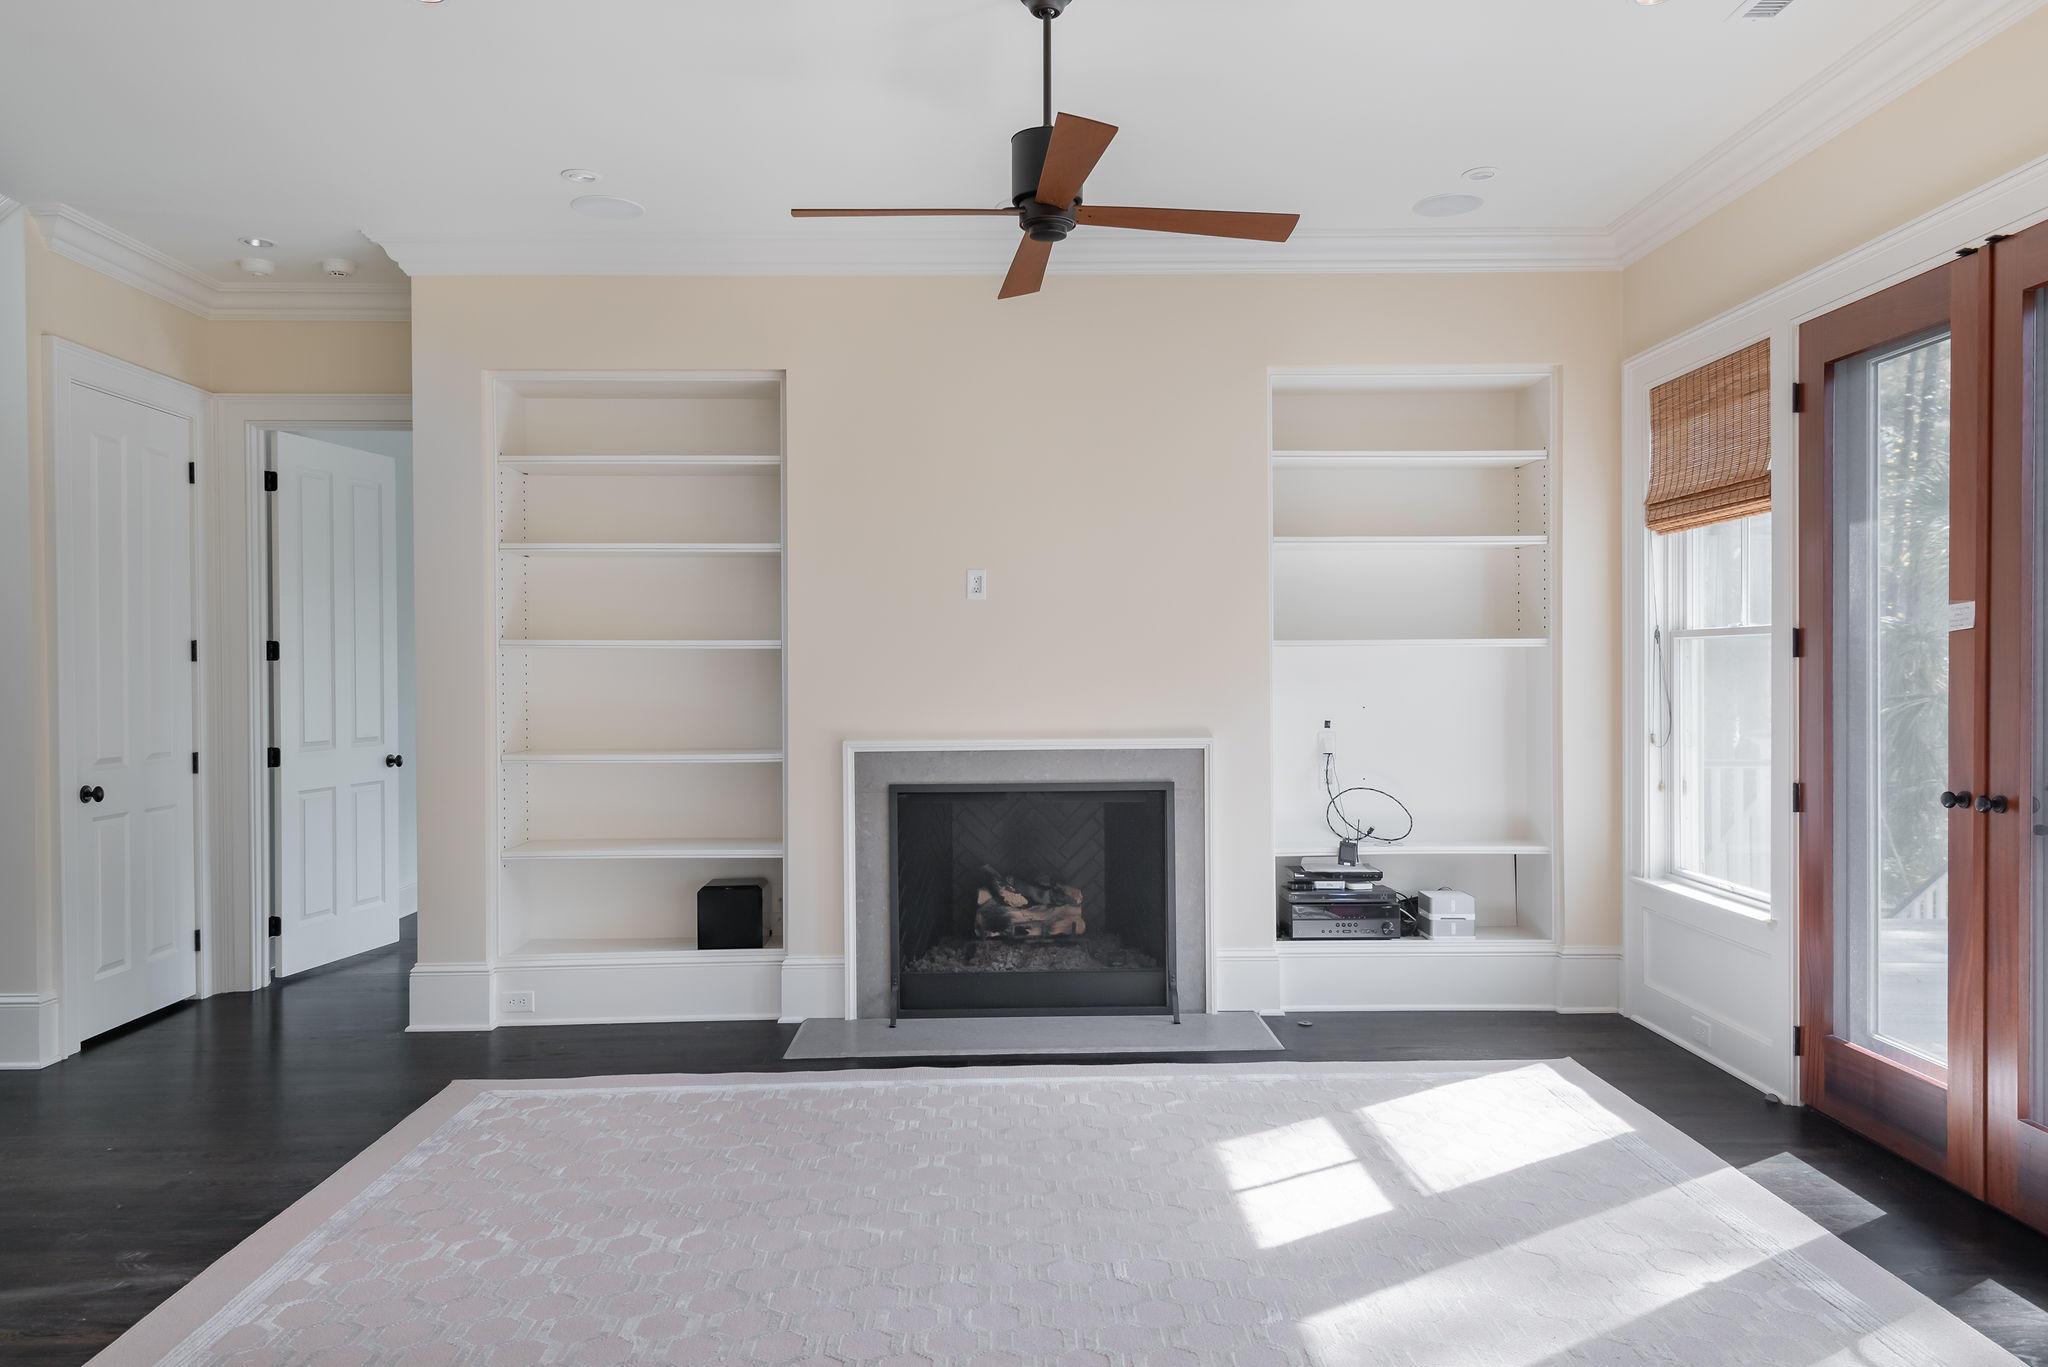 Kiawah Island Homes For Sale - 3 Grey Widgeon, Kiawah Island, SC - 60